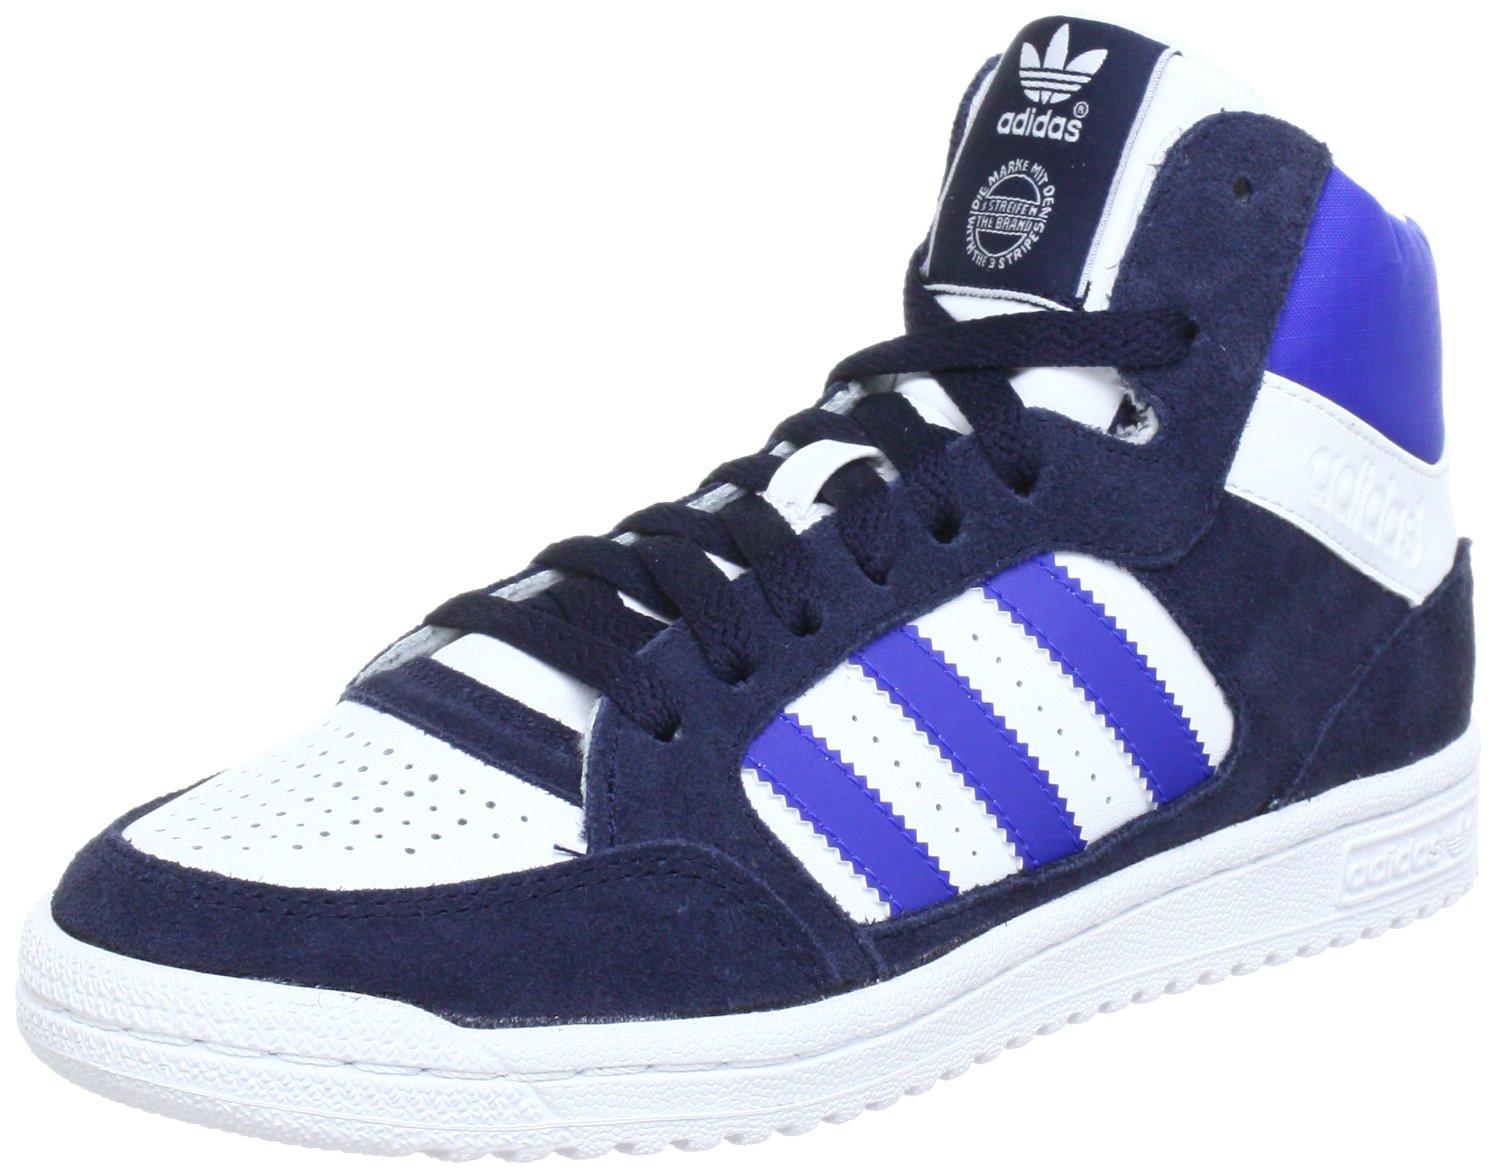 1 PlayBaskets Originals Eu Adidas Mode HommeBlancwhite Ftw Blue45 Pro true 3 vbf7gY6y